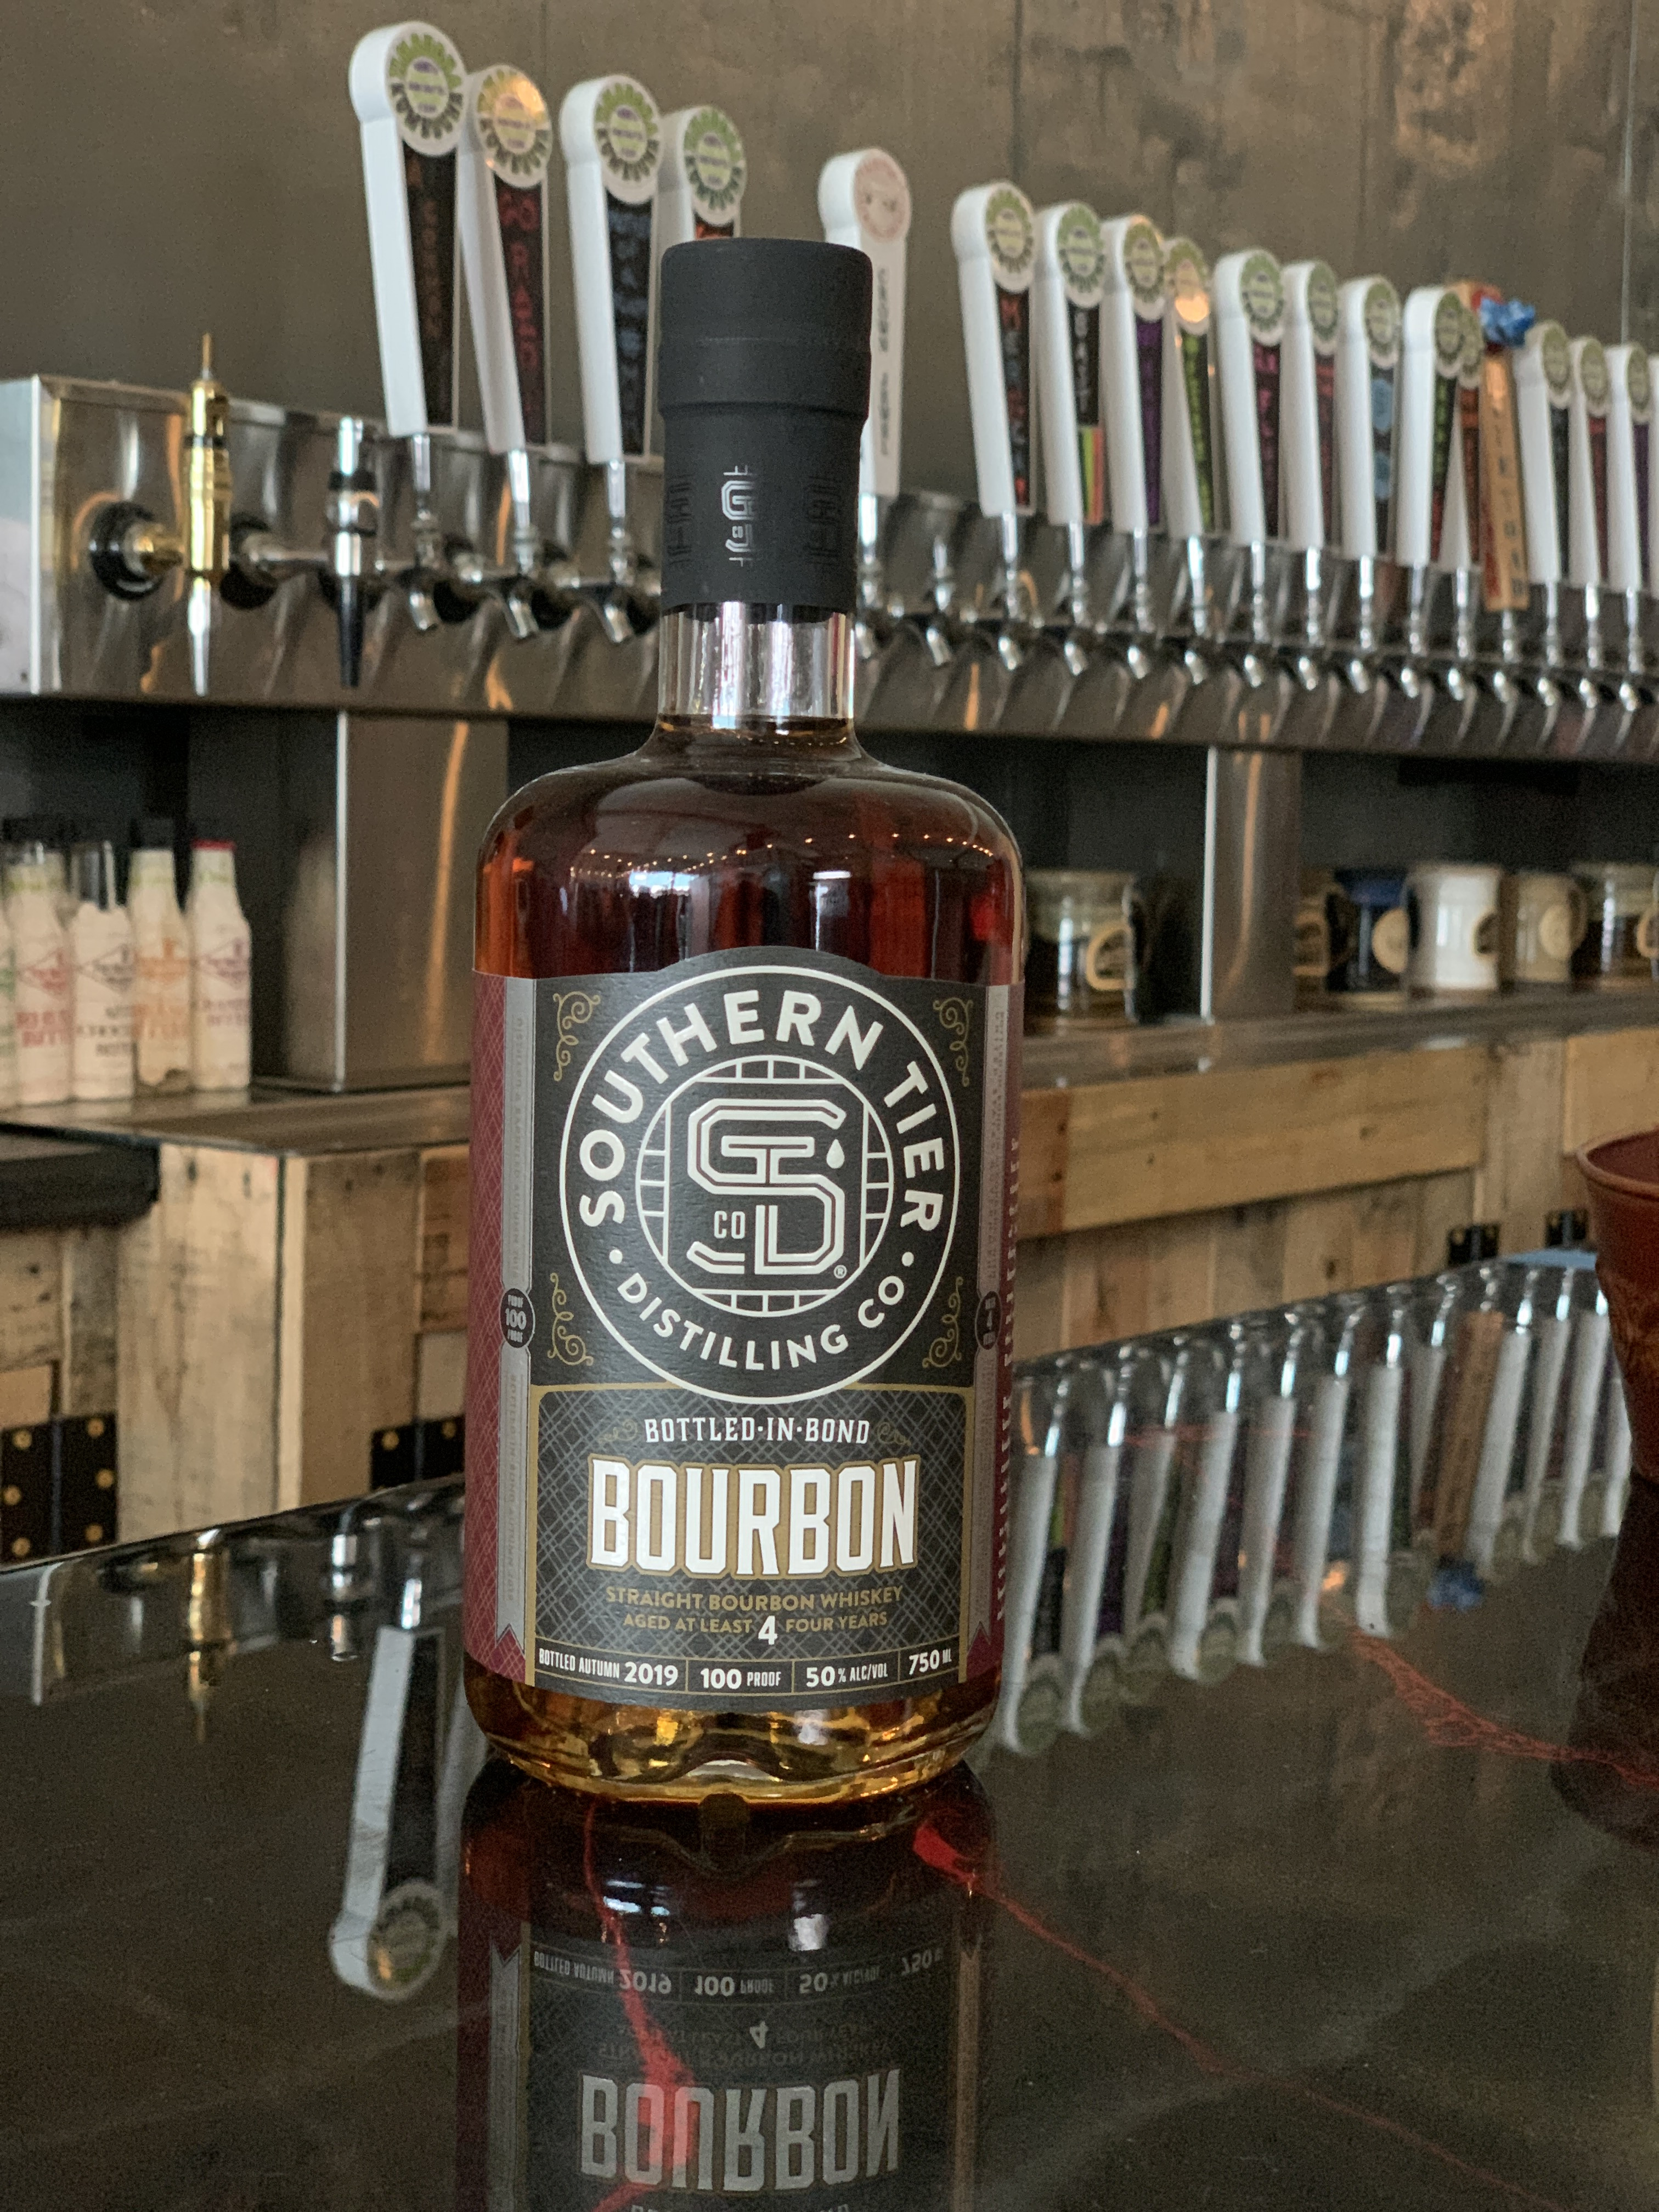 Southern Tier Bottled in Bond Bourbon